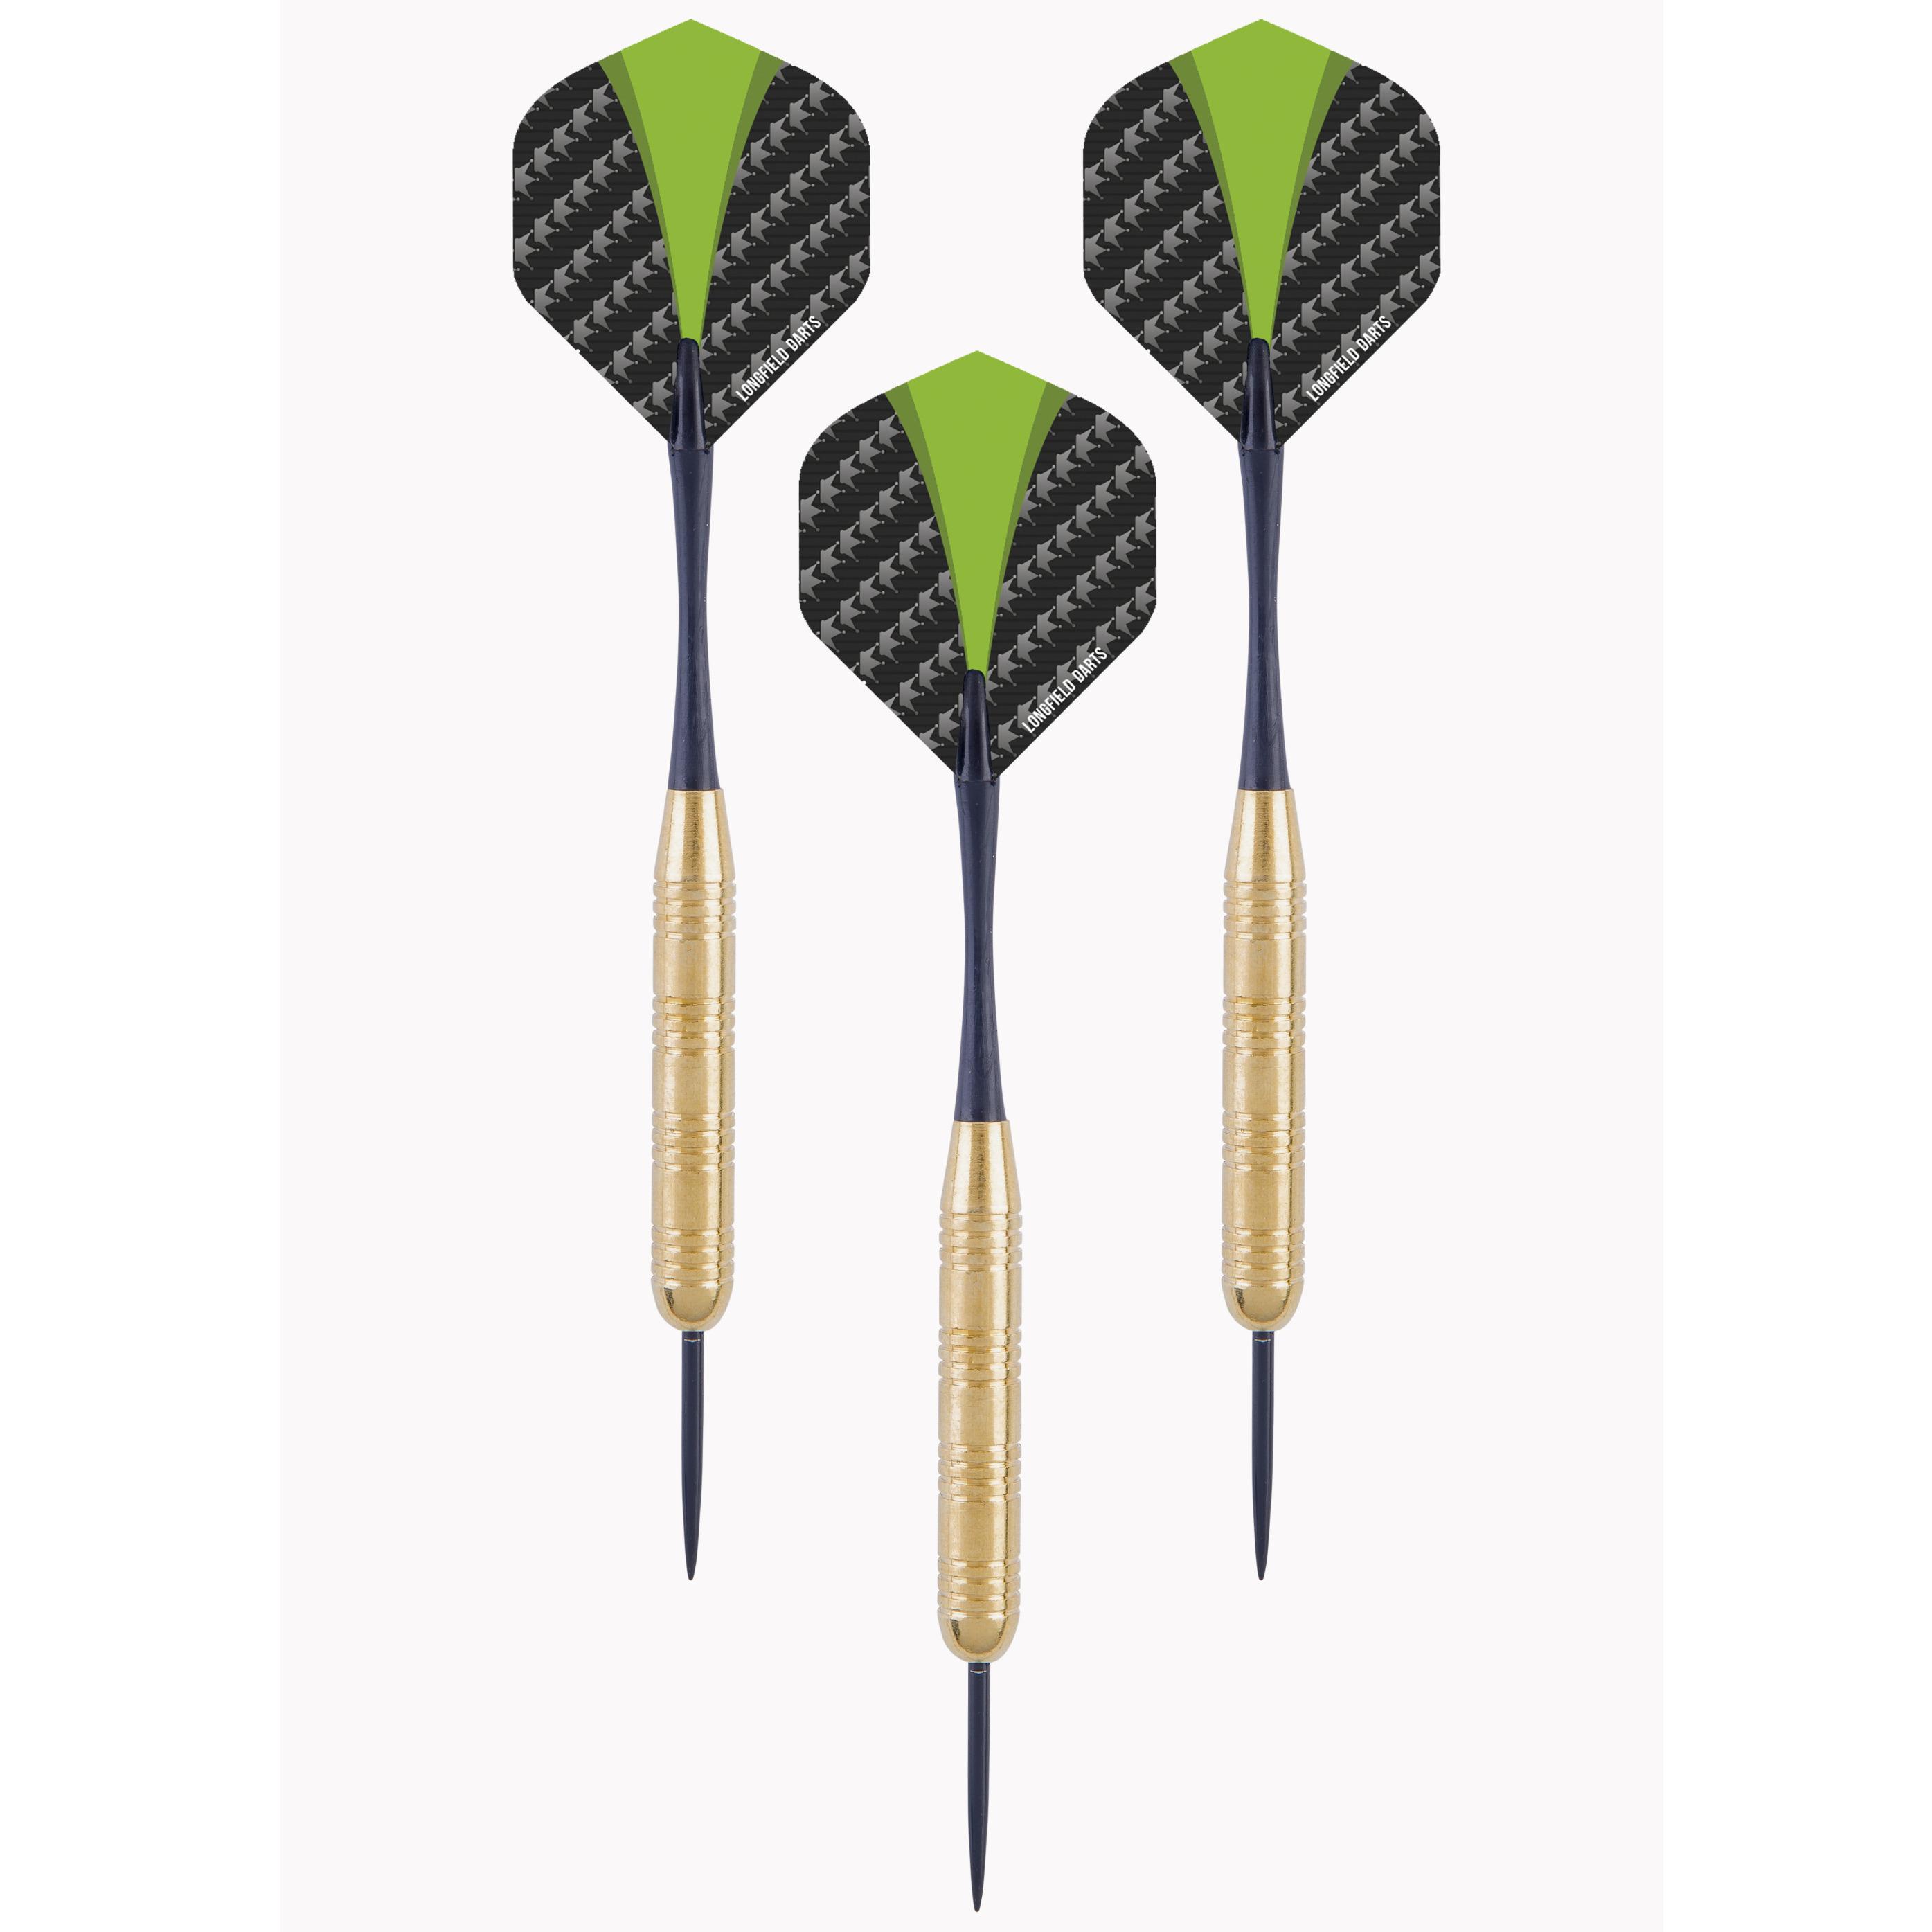 4x Set van 3 dartpijlen Longfield darts brass 21 grams